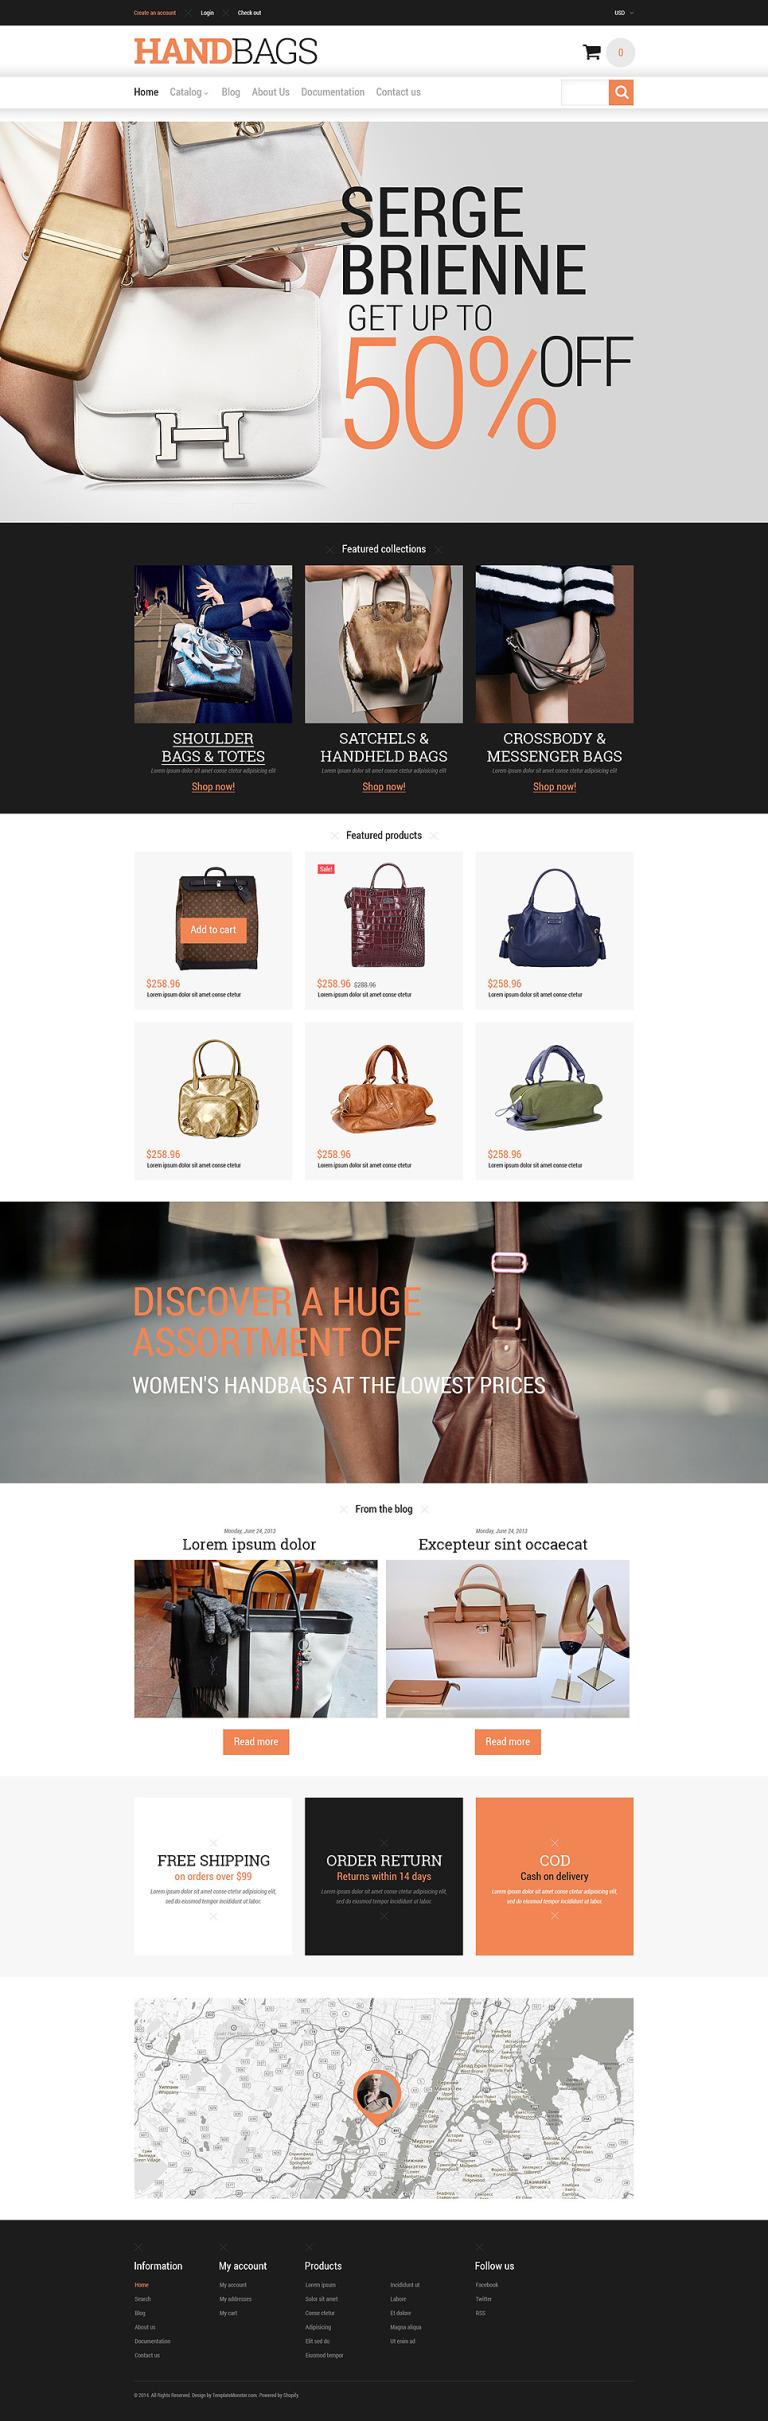 Branded Handbags Shopify Theme New Screenshots BIG